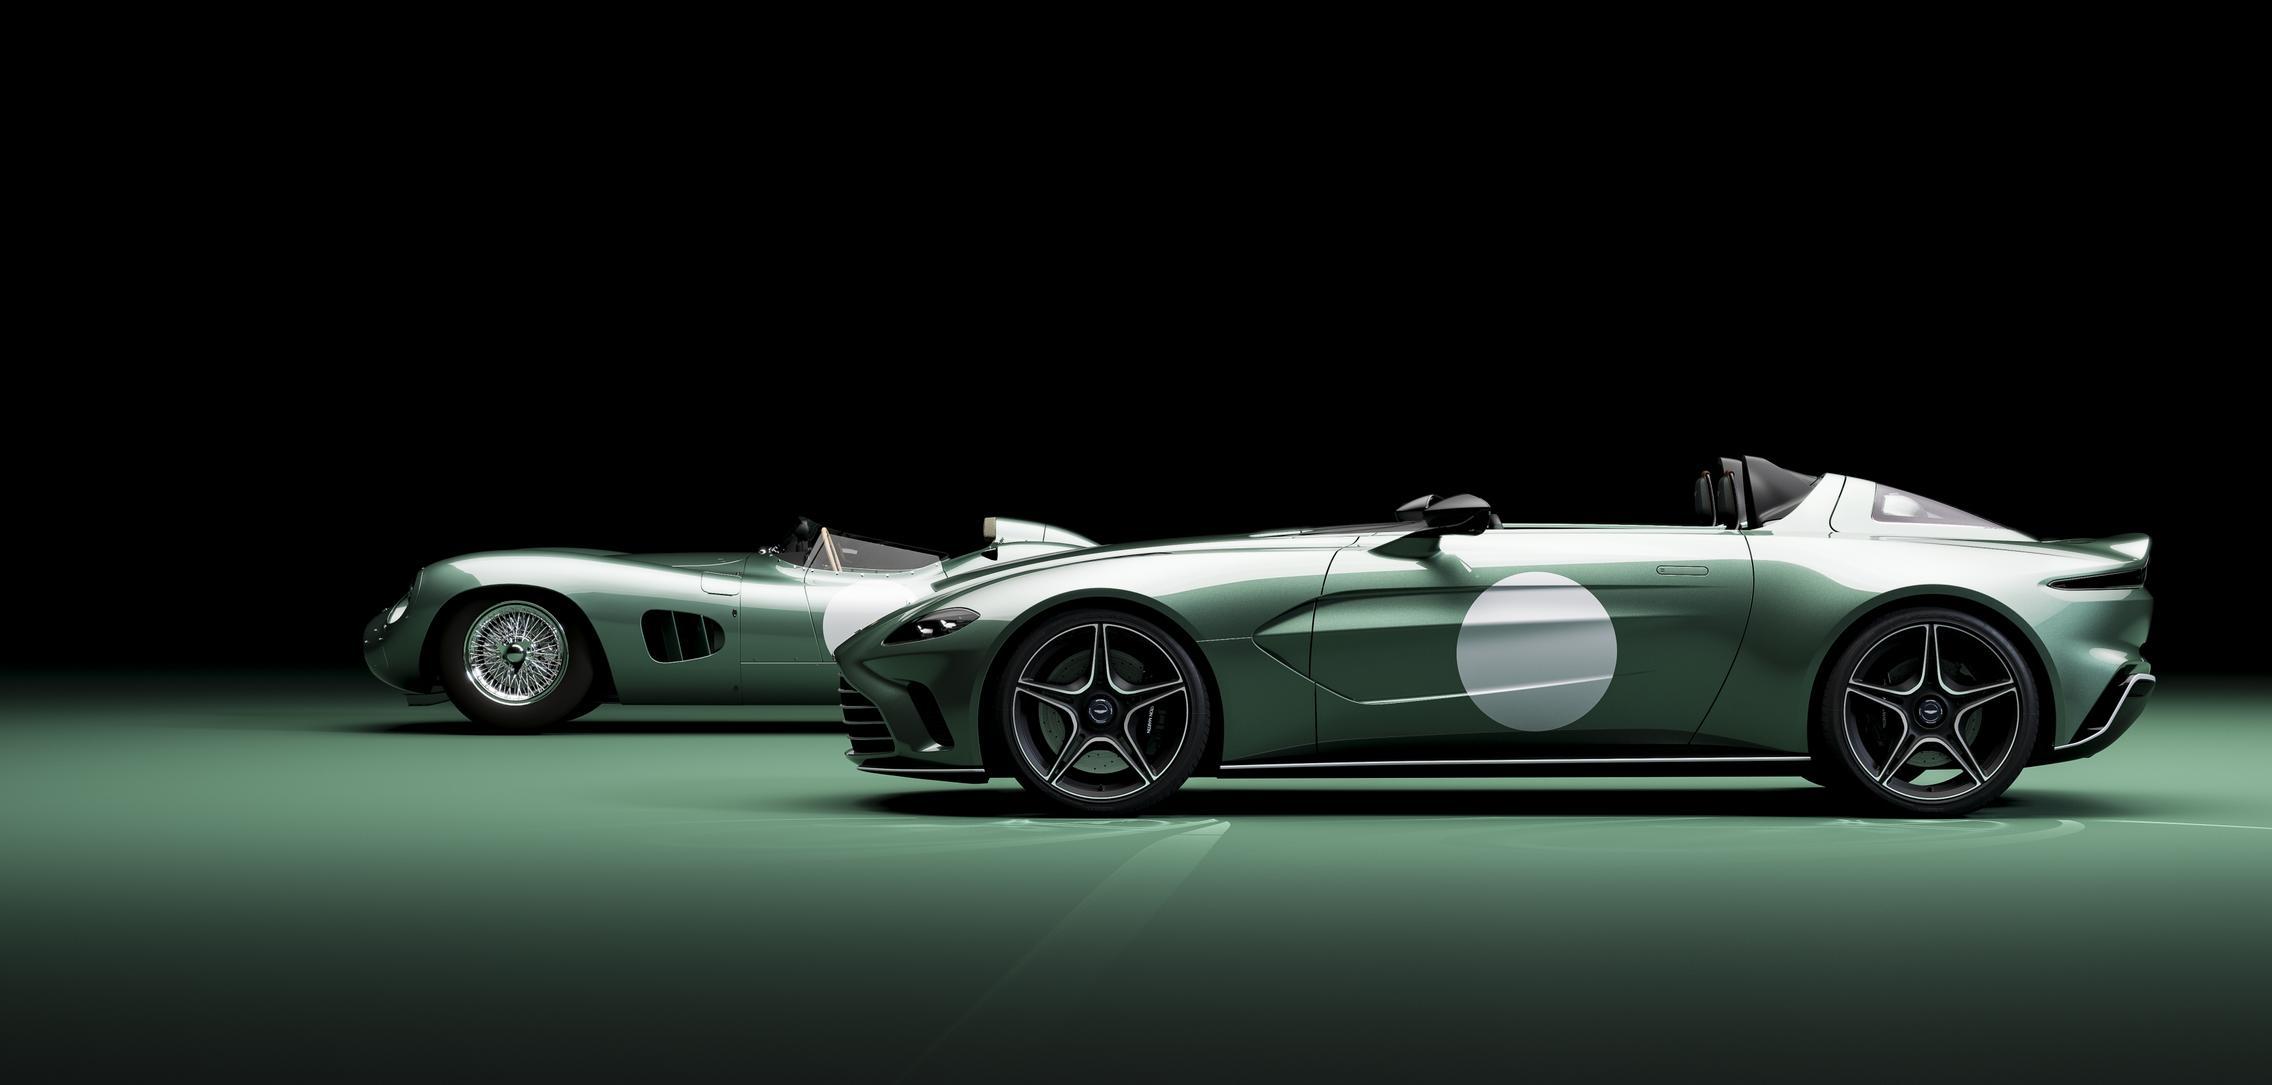 Aston Martin V12 Speedster side